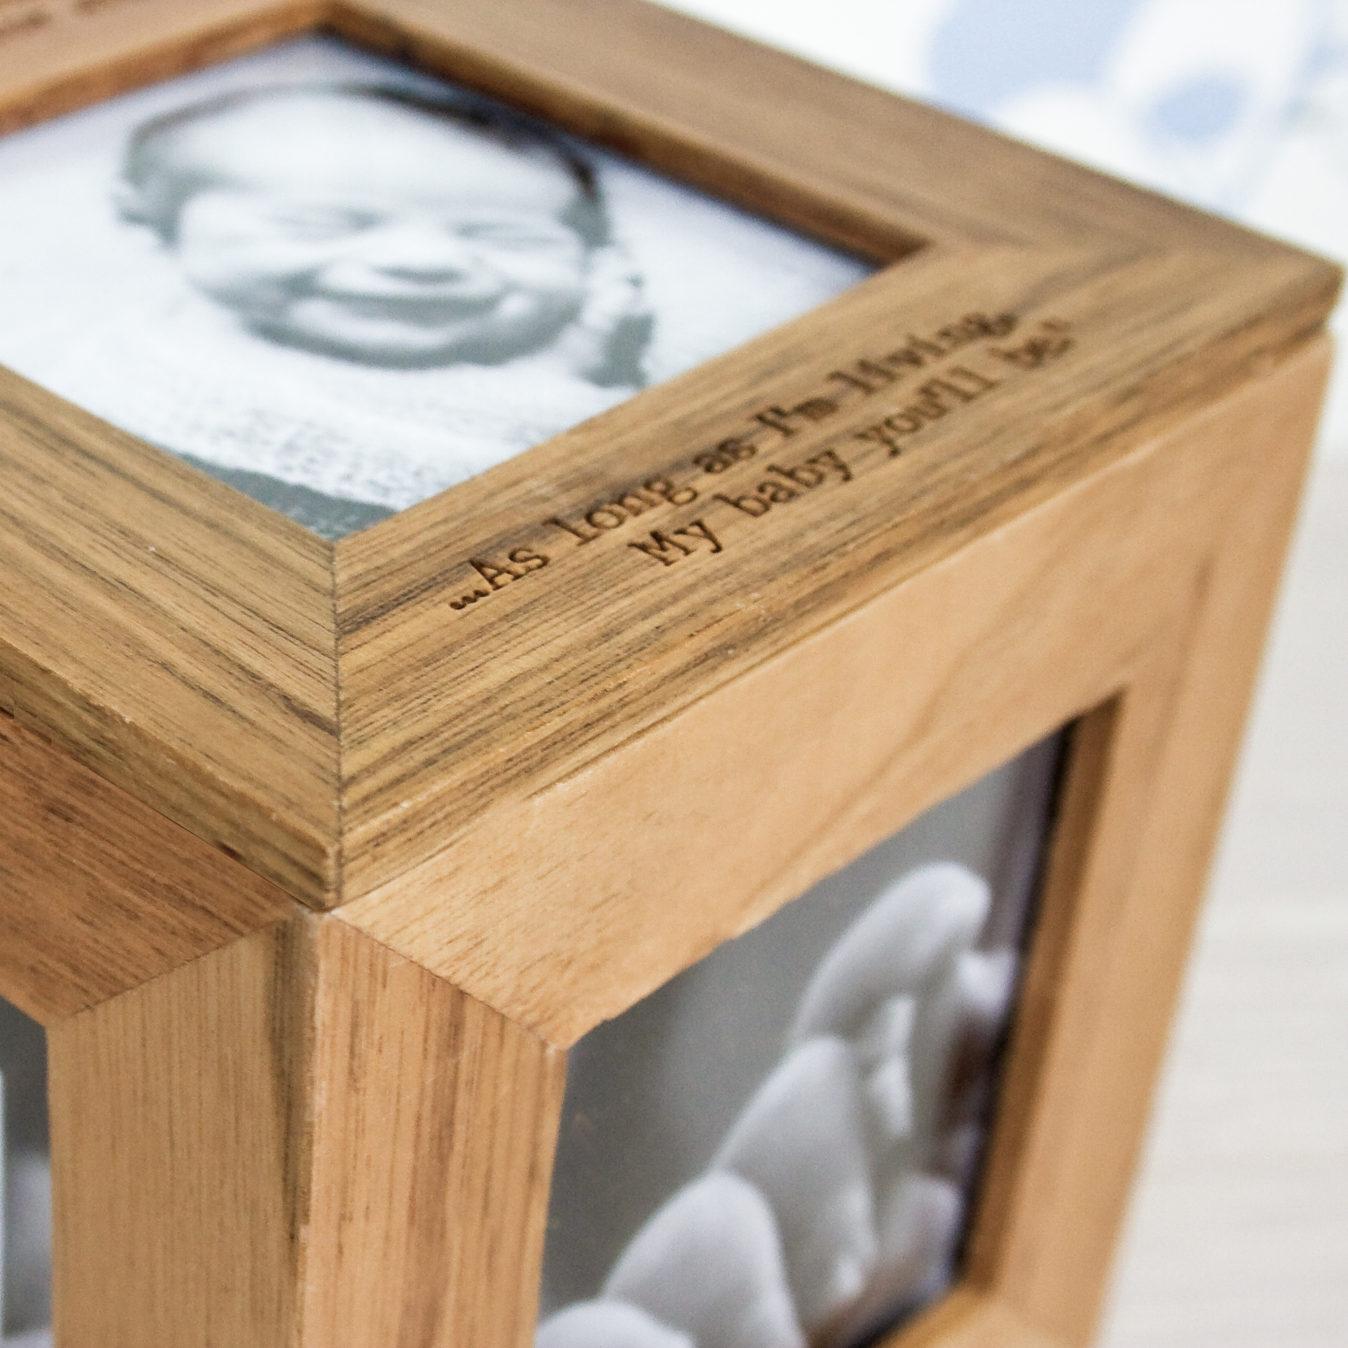 Personalised Oak Photo Cube Keepsake Box - The Gift Gazebo